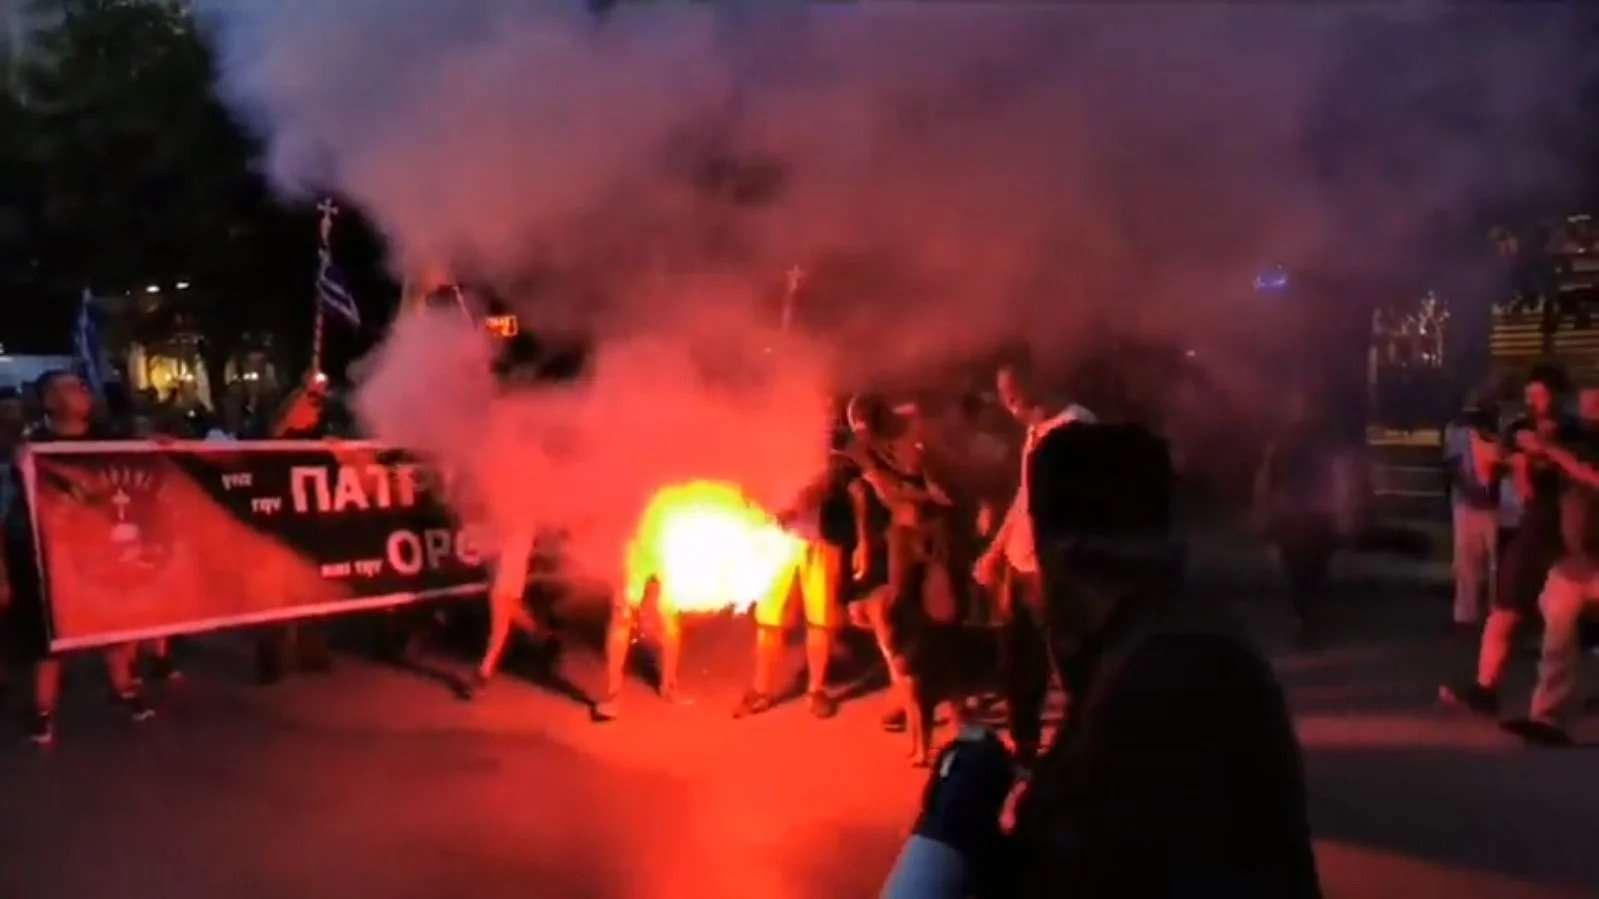 Yunanistan'da Ayasofya'nın Açılışı Protesto Edildi 1